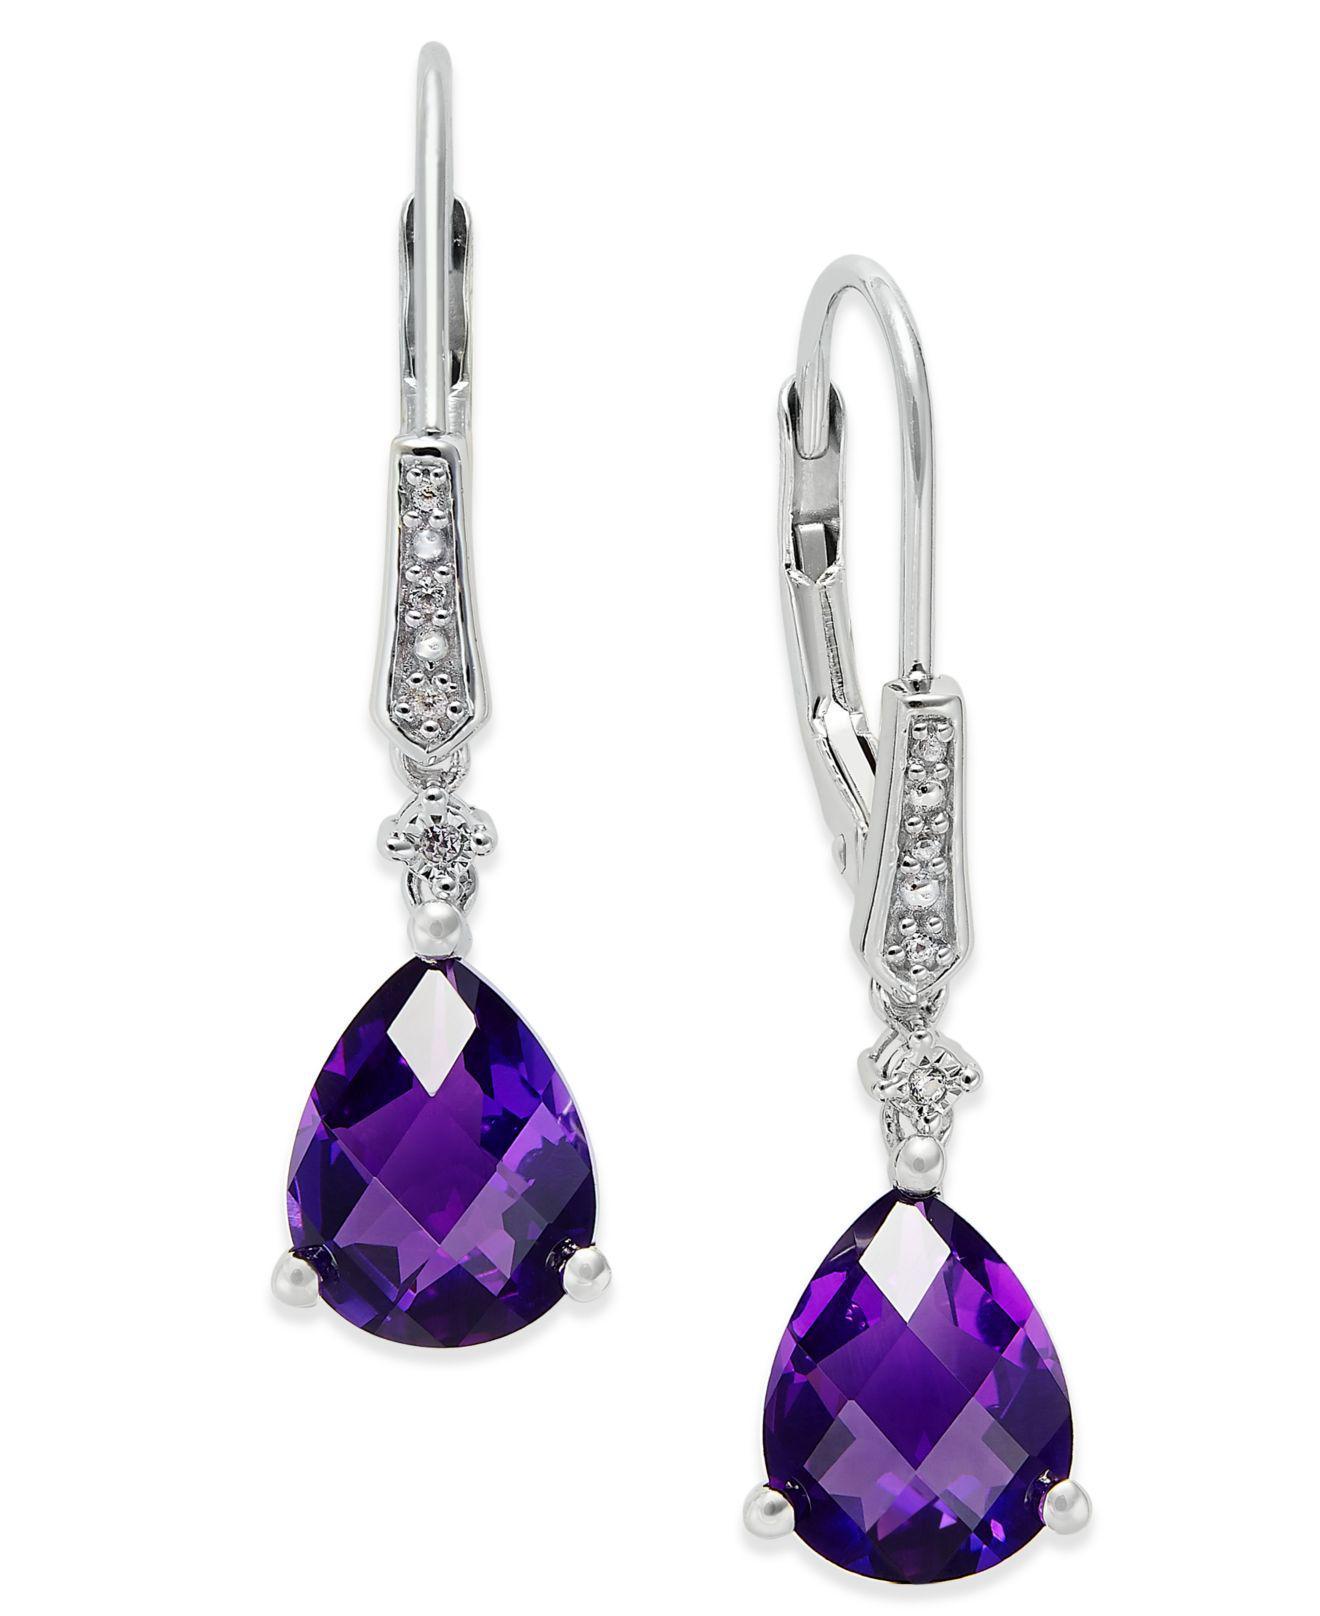 4562430a0 Macy's. Women's Metallic Gemstone (3 Ct. T.w.) And Diamond Accent Birthstone  Drop Earrings In Sterling Silver